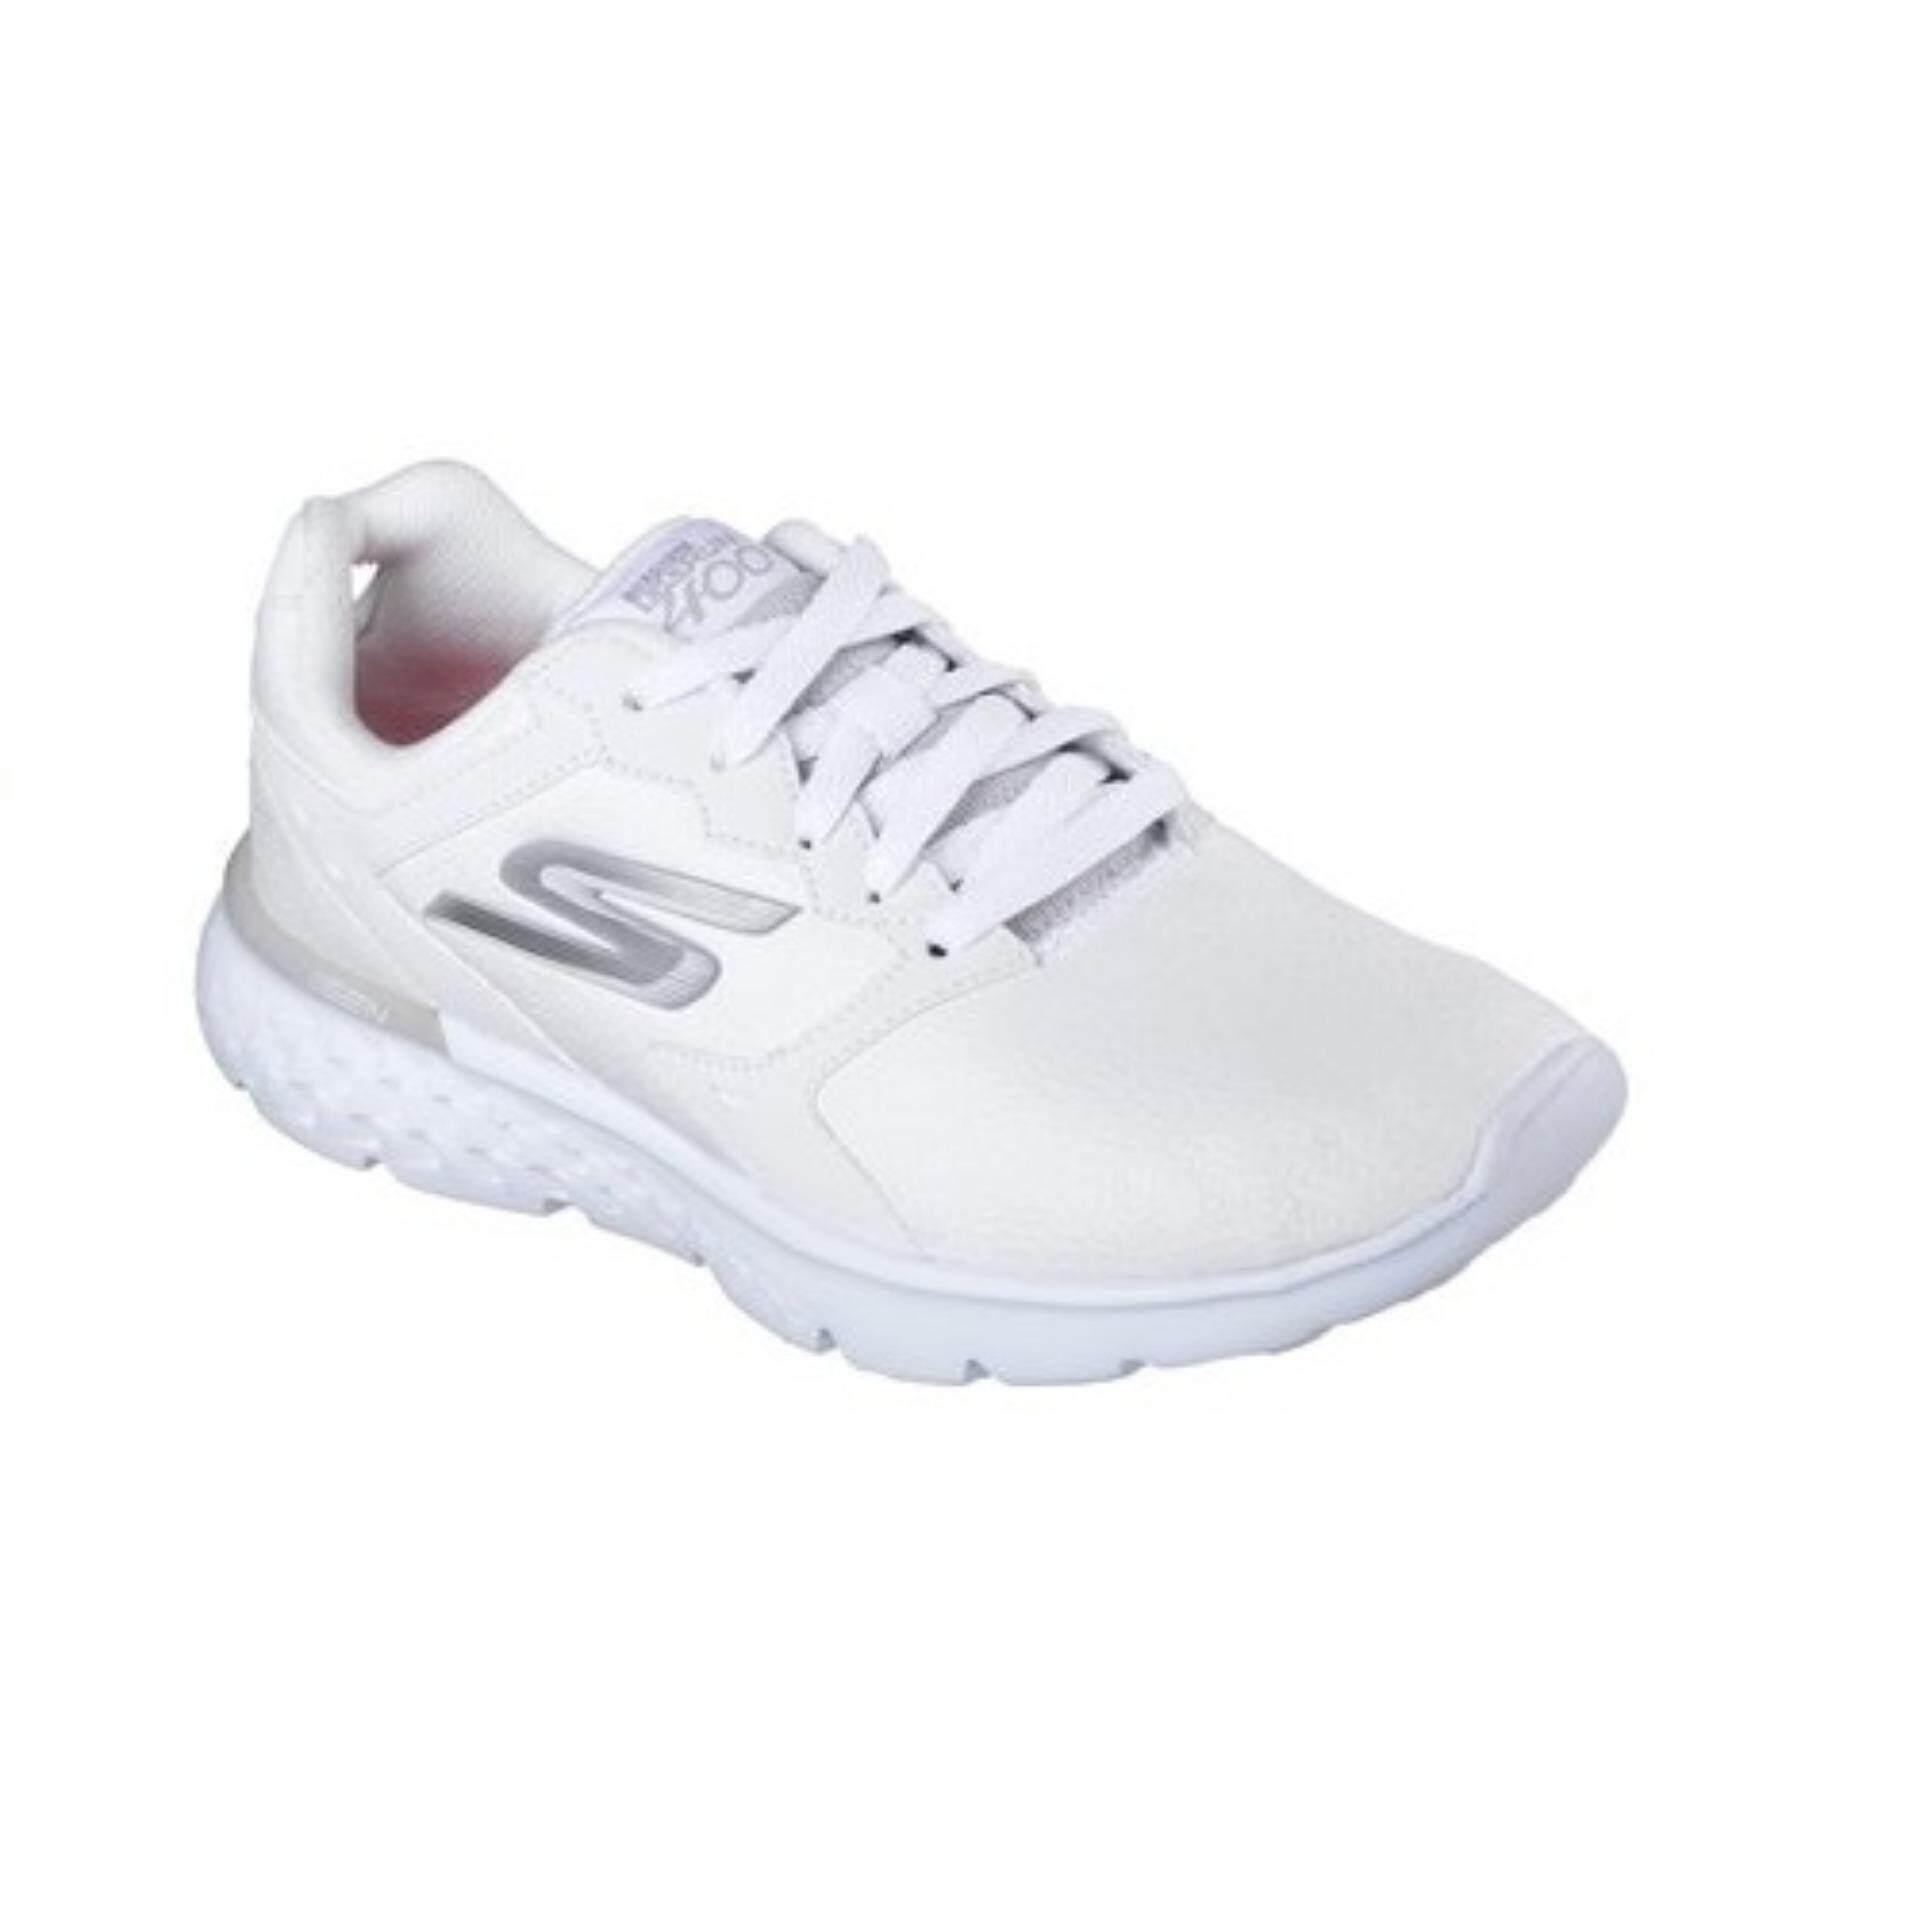 skechers running shoes malaysia